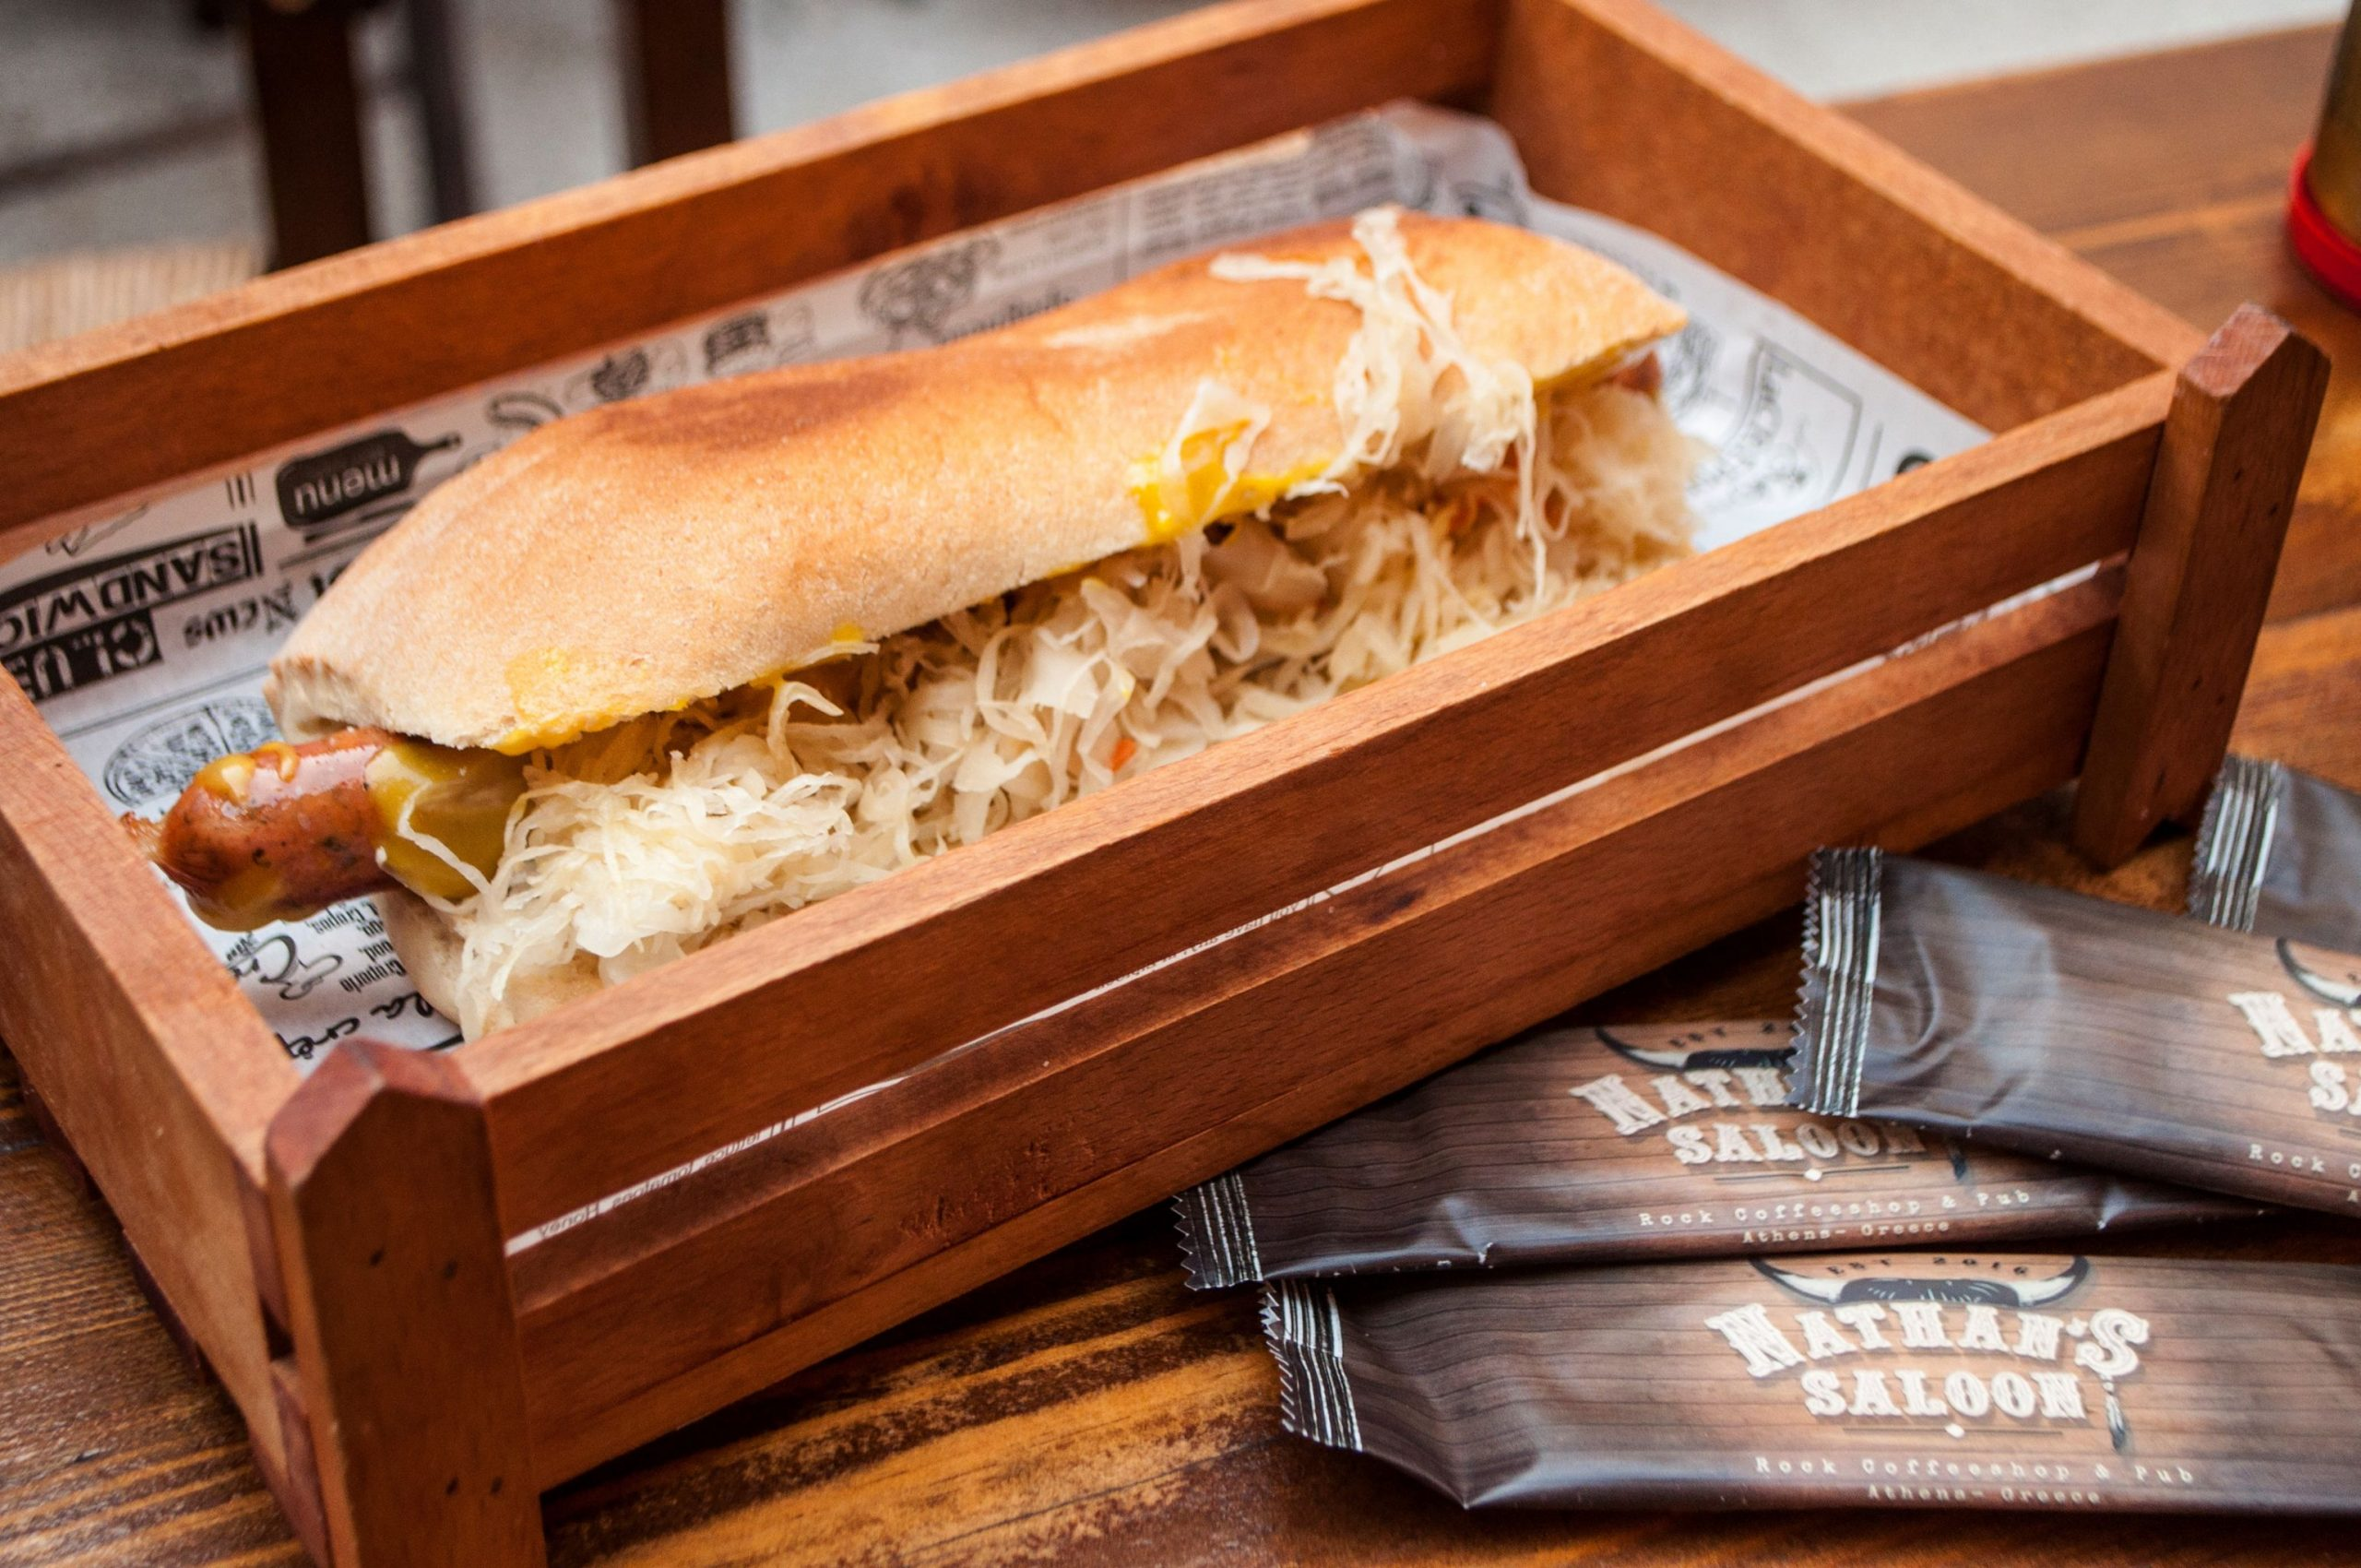 Nathan's Saloon: Η ροκ παμπ με το φαγητό που θα σε στοιχειώσει